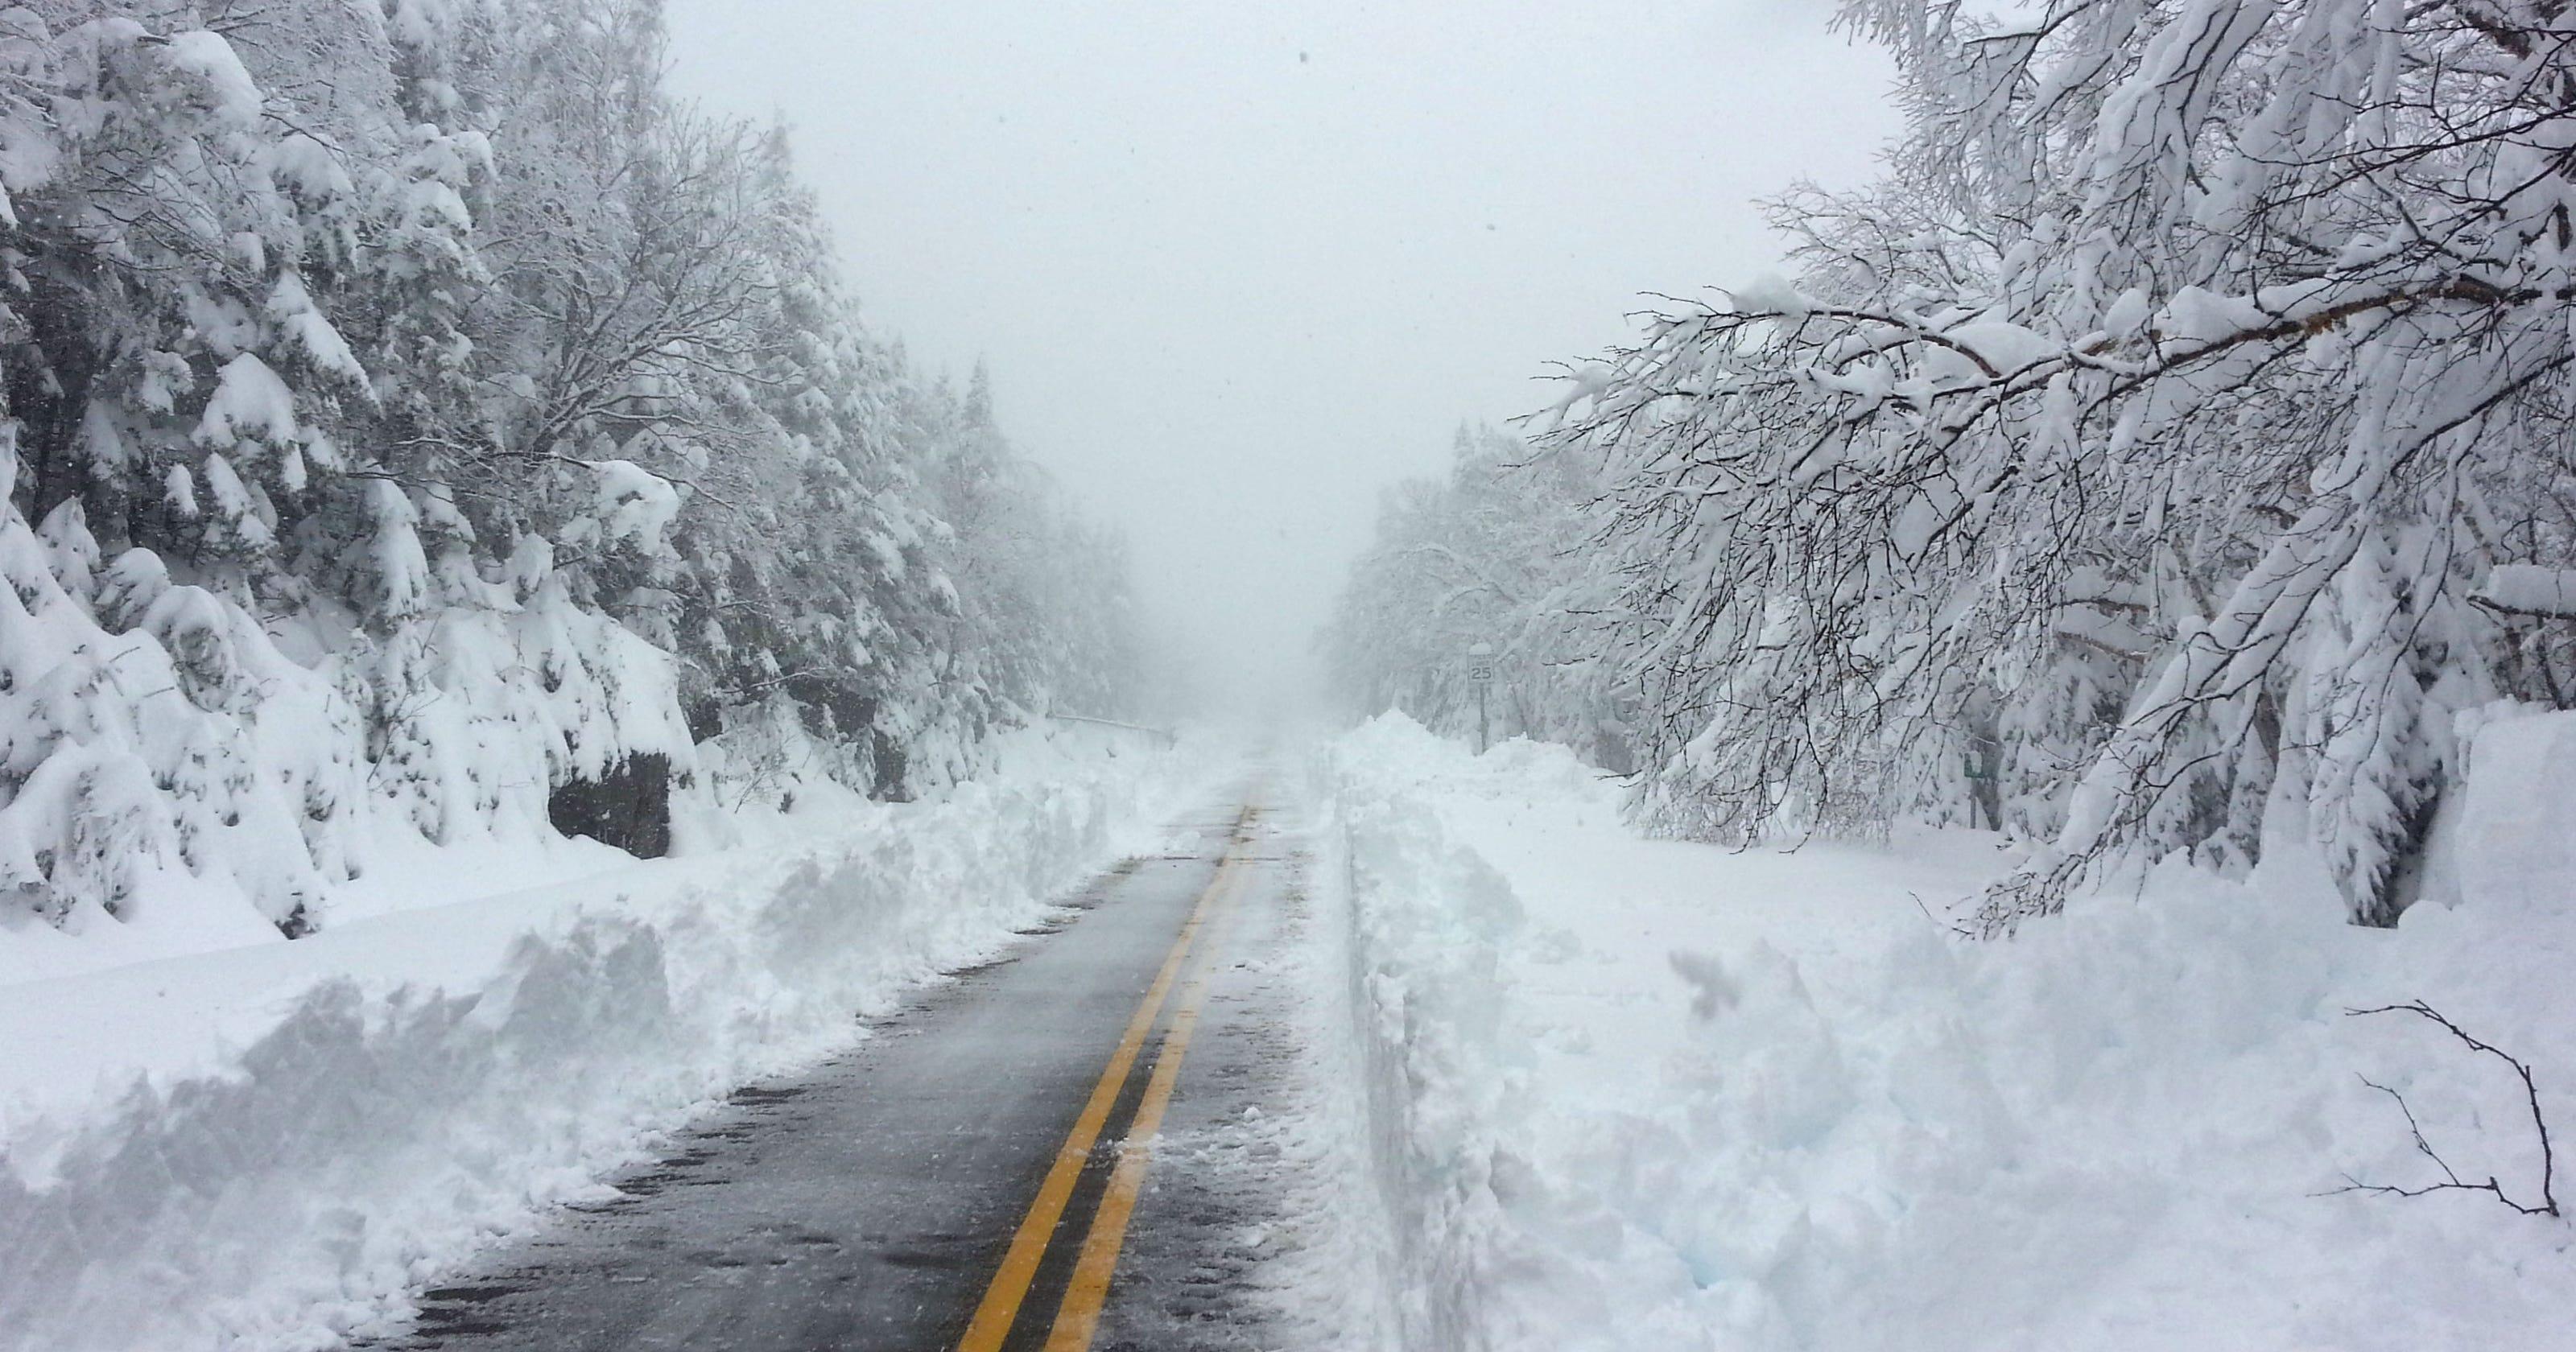 Memorial Day mess: 3 feet of snow falls in Upstate N.Y.